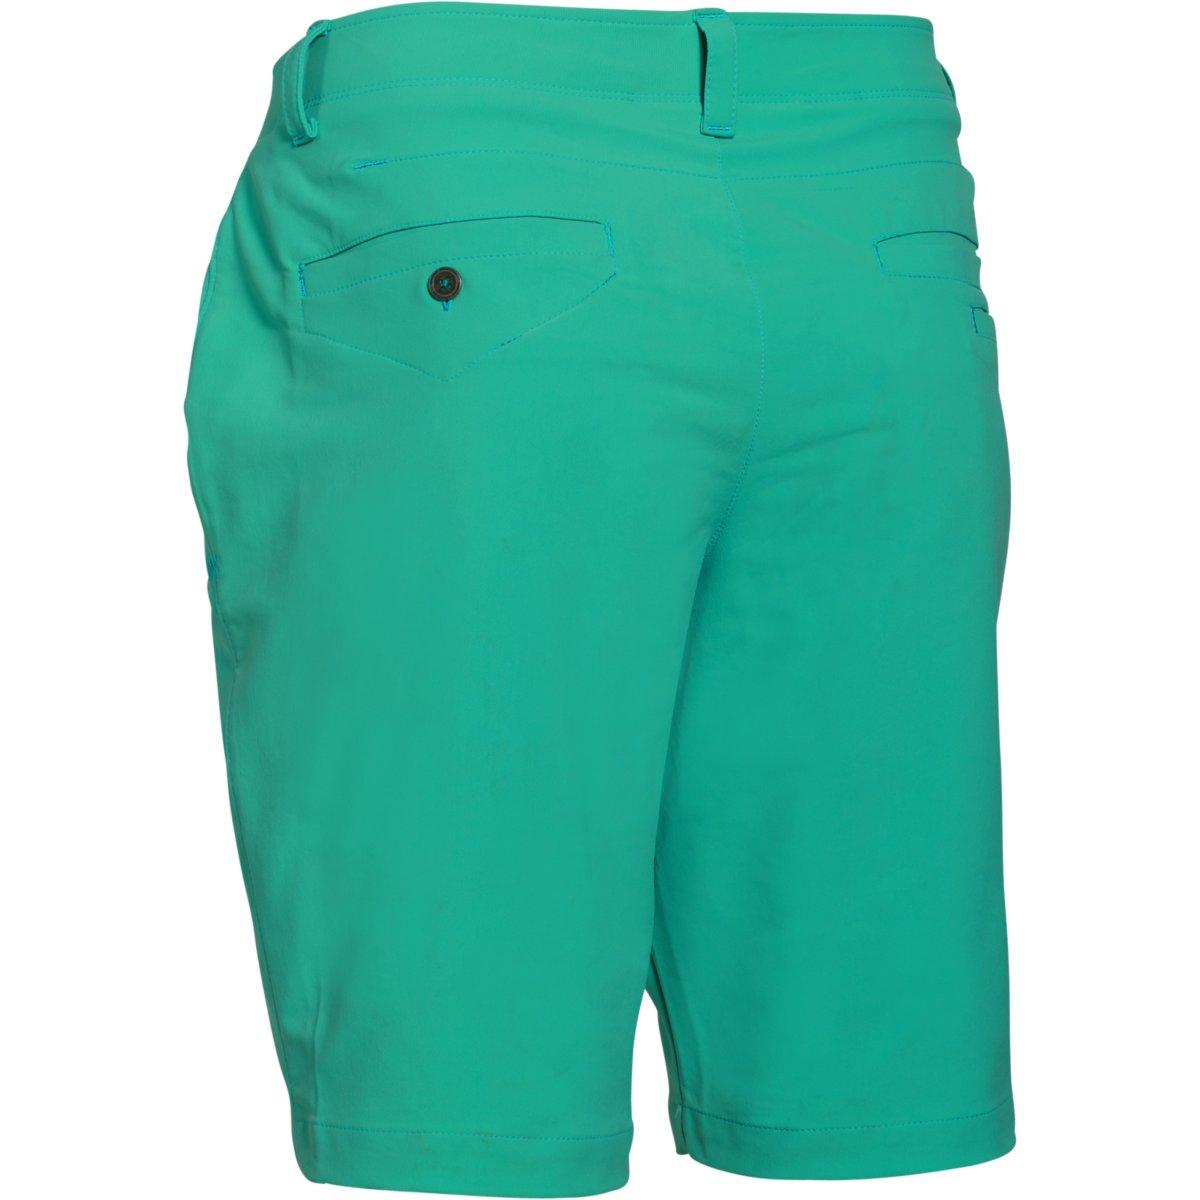 Under-Armour-Homme-UA-Match-Play-conique-Tech-Performance-Golf-Shorts-29-off-RRP miniature 13